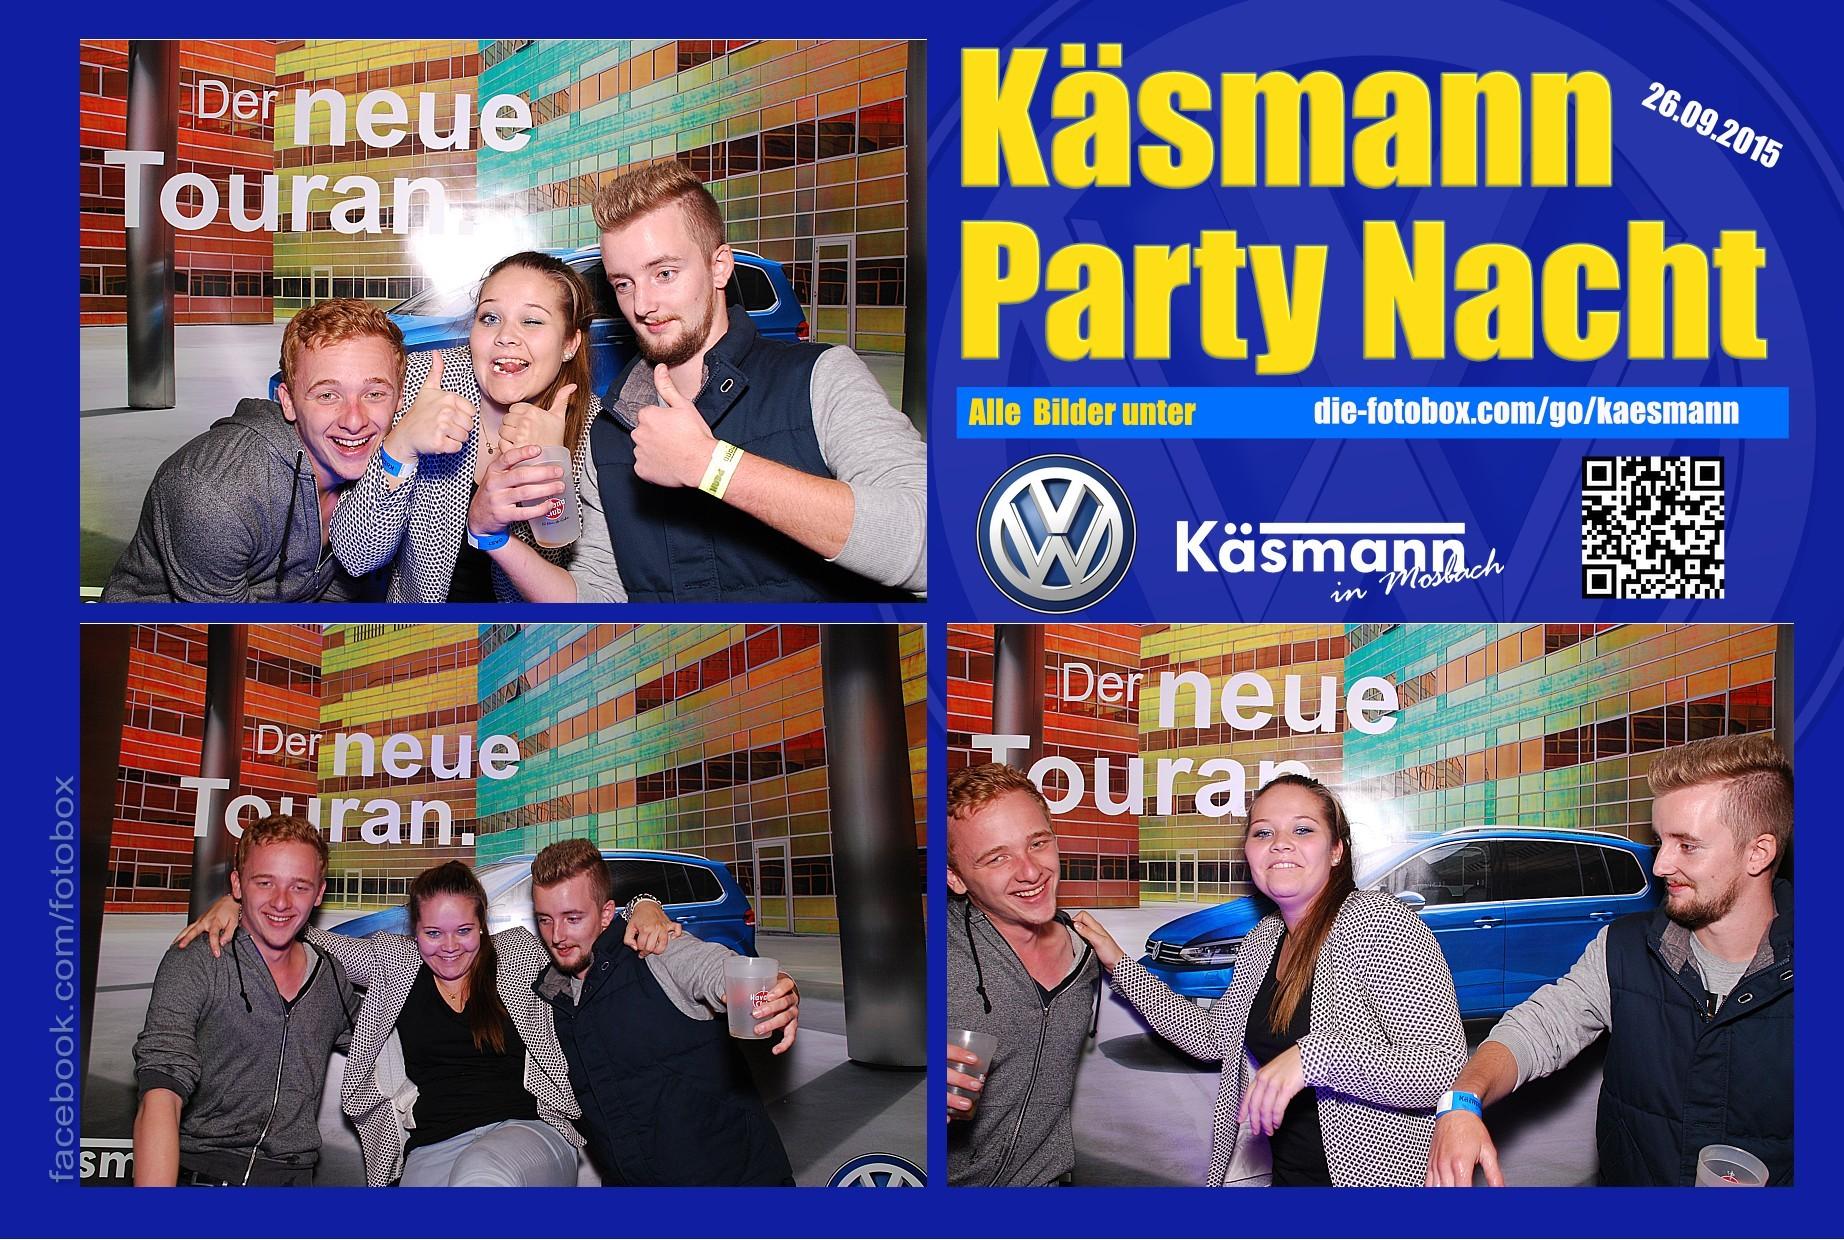 Käsmannparty 2015 - www.die-fotobox.com 01382